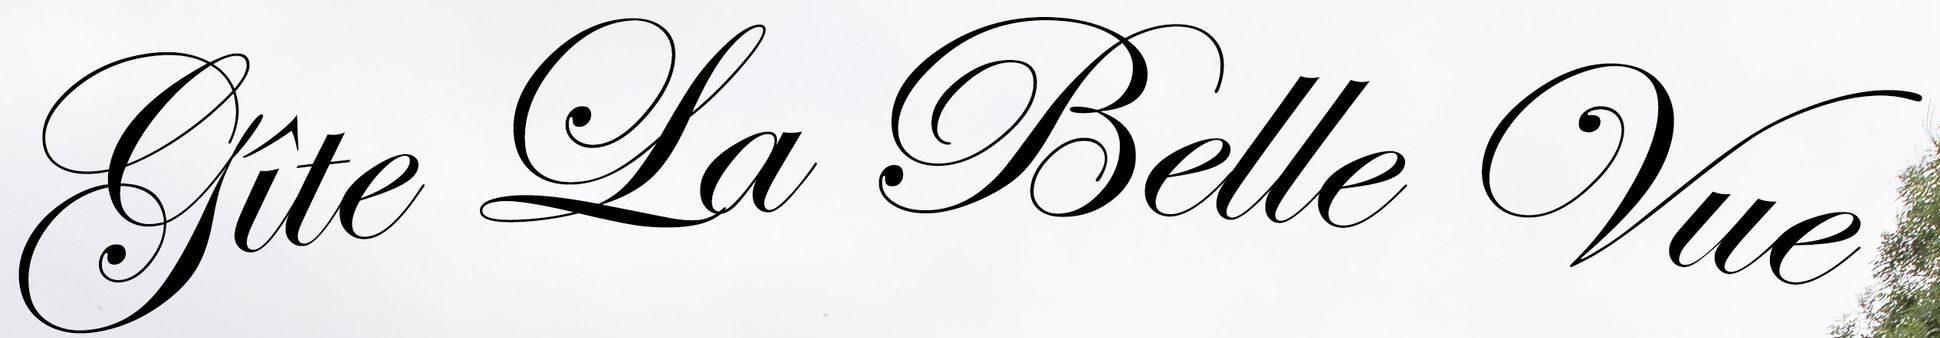 cropped-logo101-2.jpg